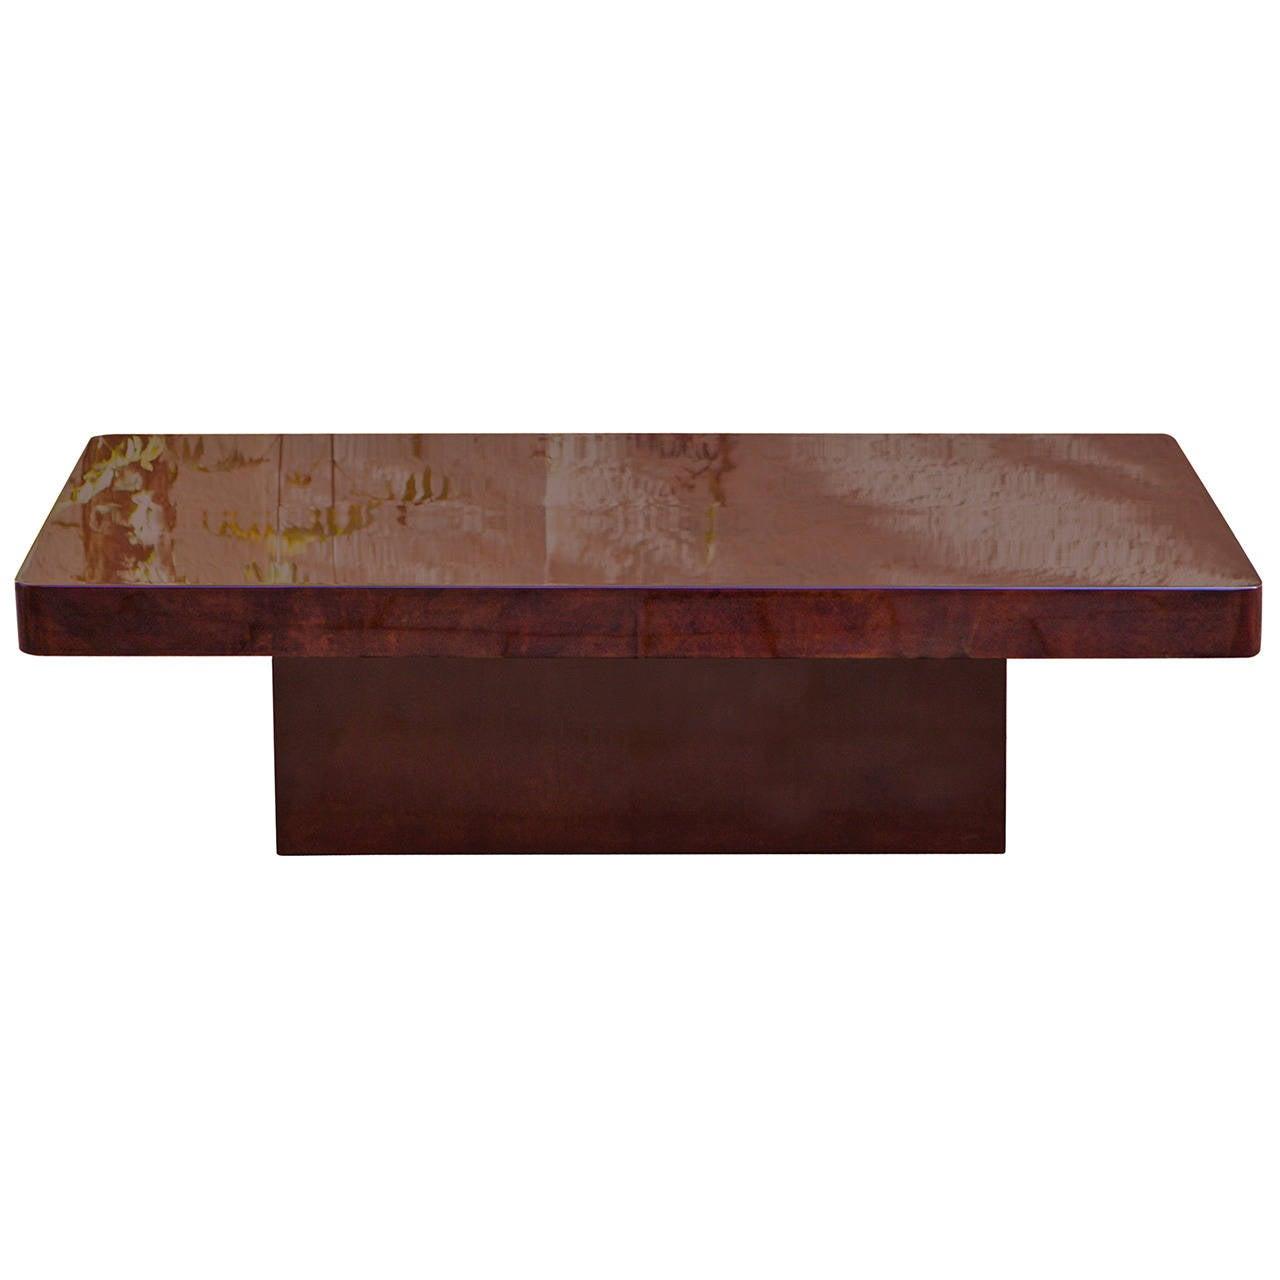 Modern aldo tura red goatskin coffee table for sale at 1stdibs for Red modern coffee table